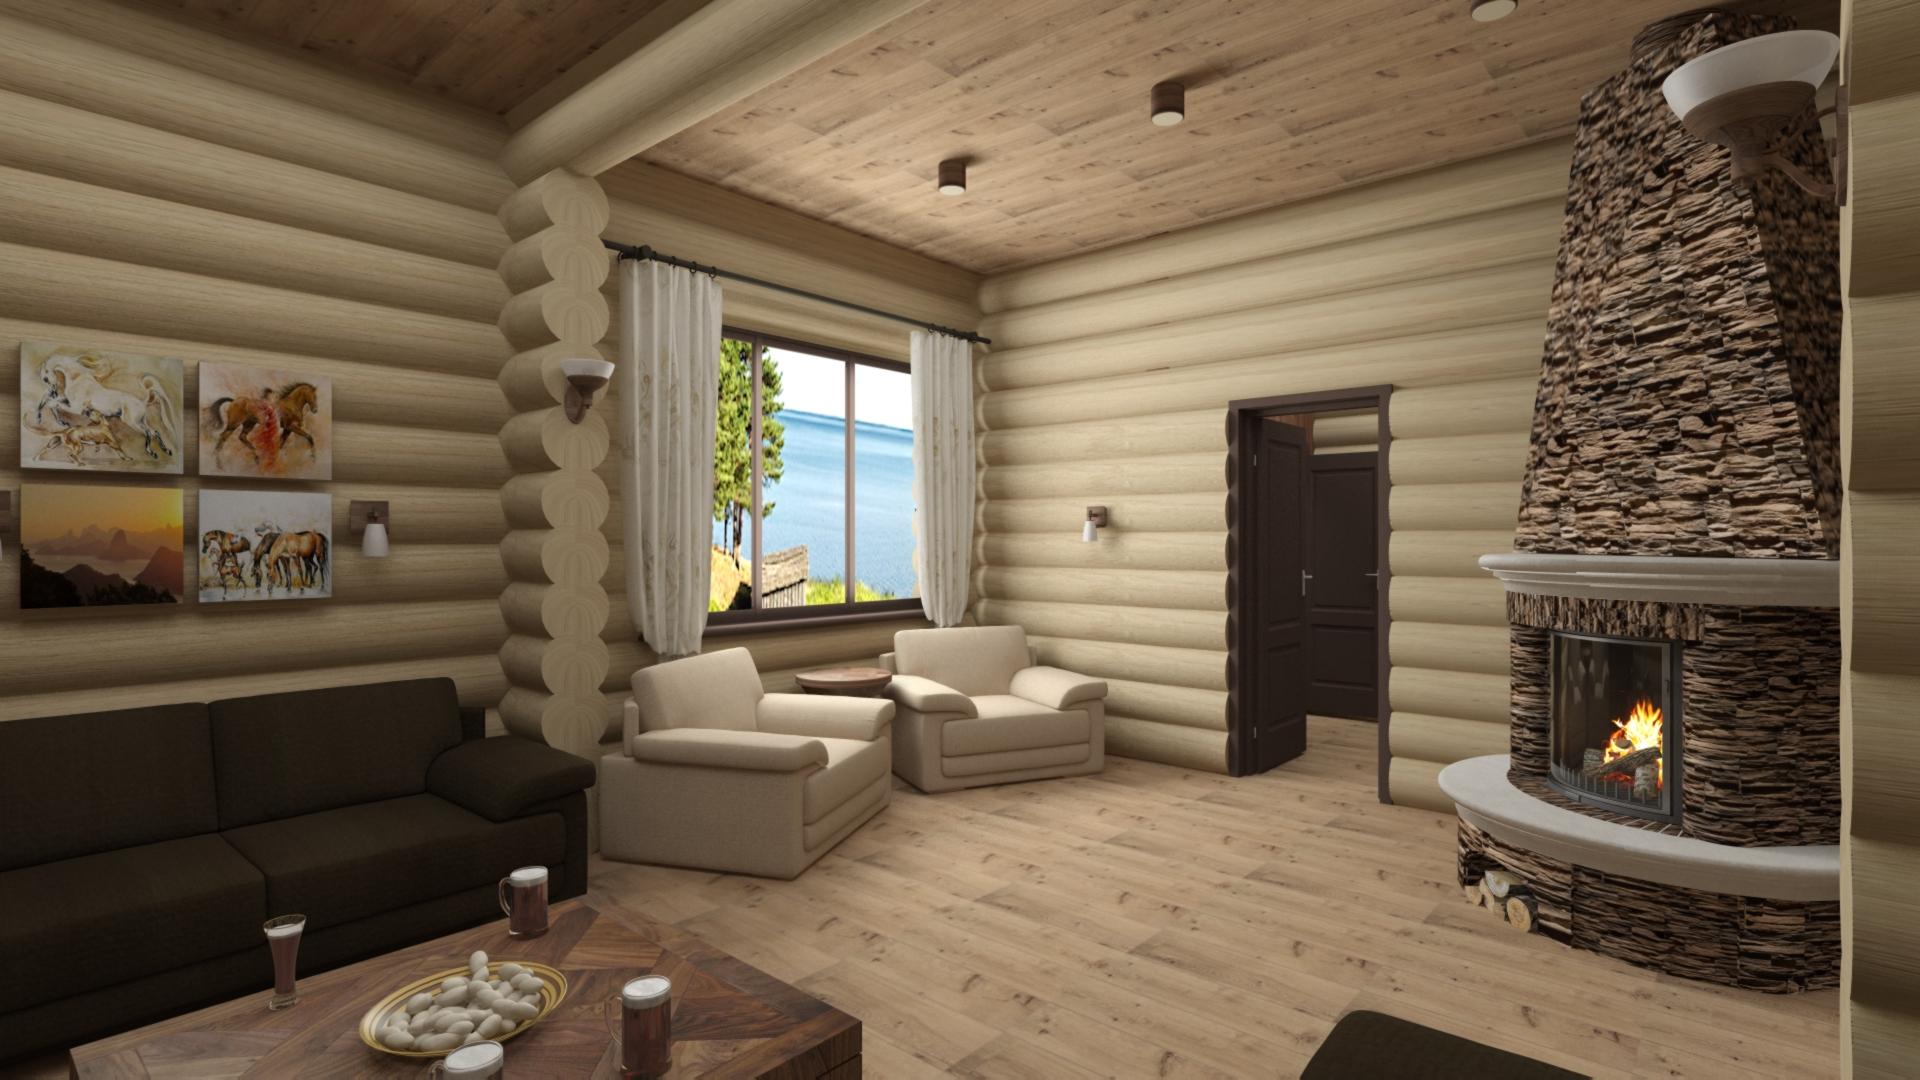 Дизайн комнаты отдыха